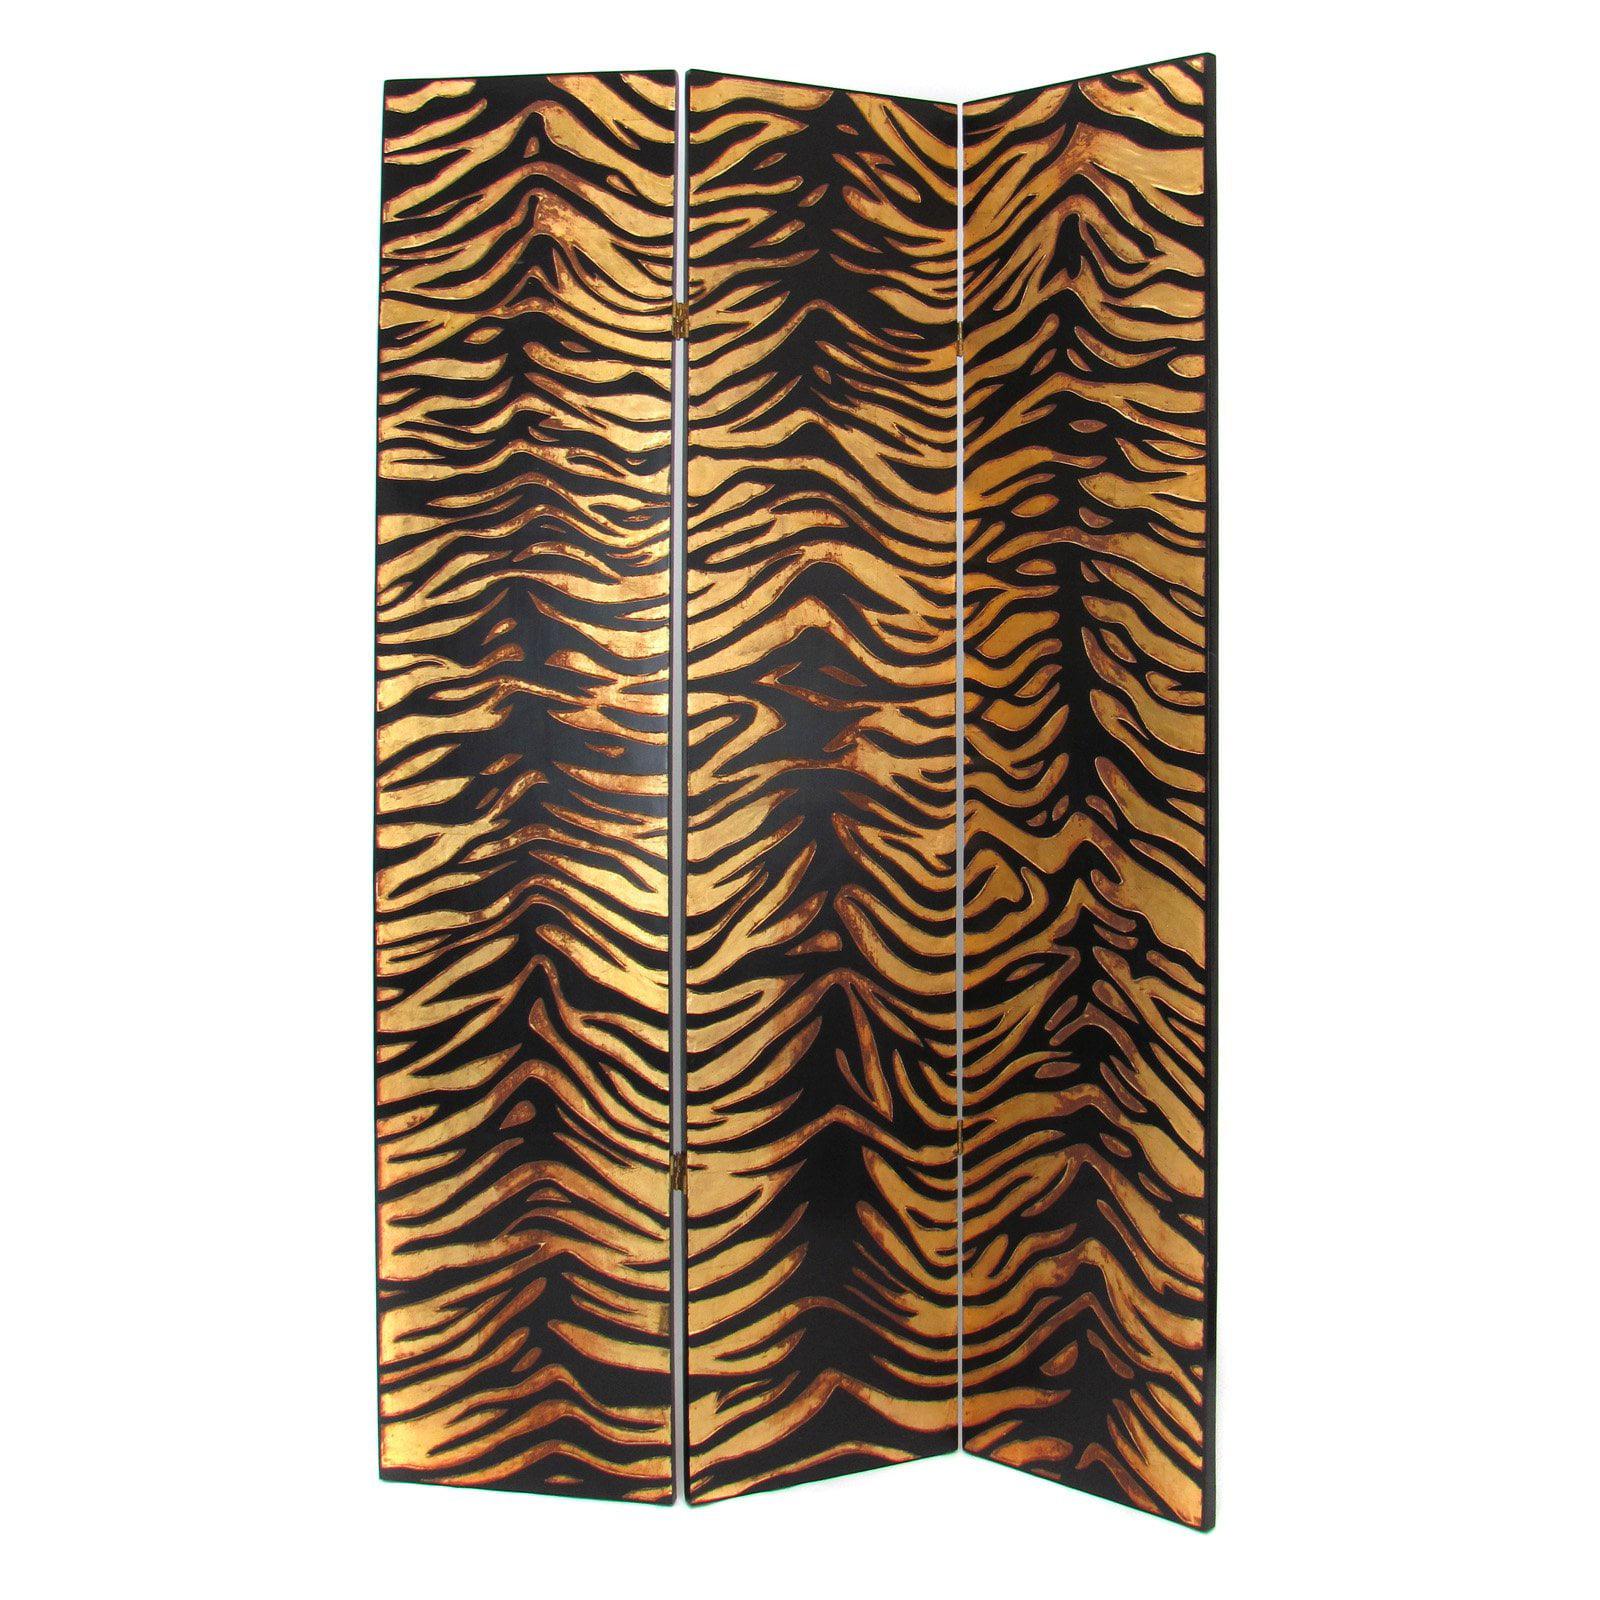 Wayborn 2302X Gold Leaf Zebra Screen Room Divider